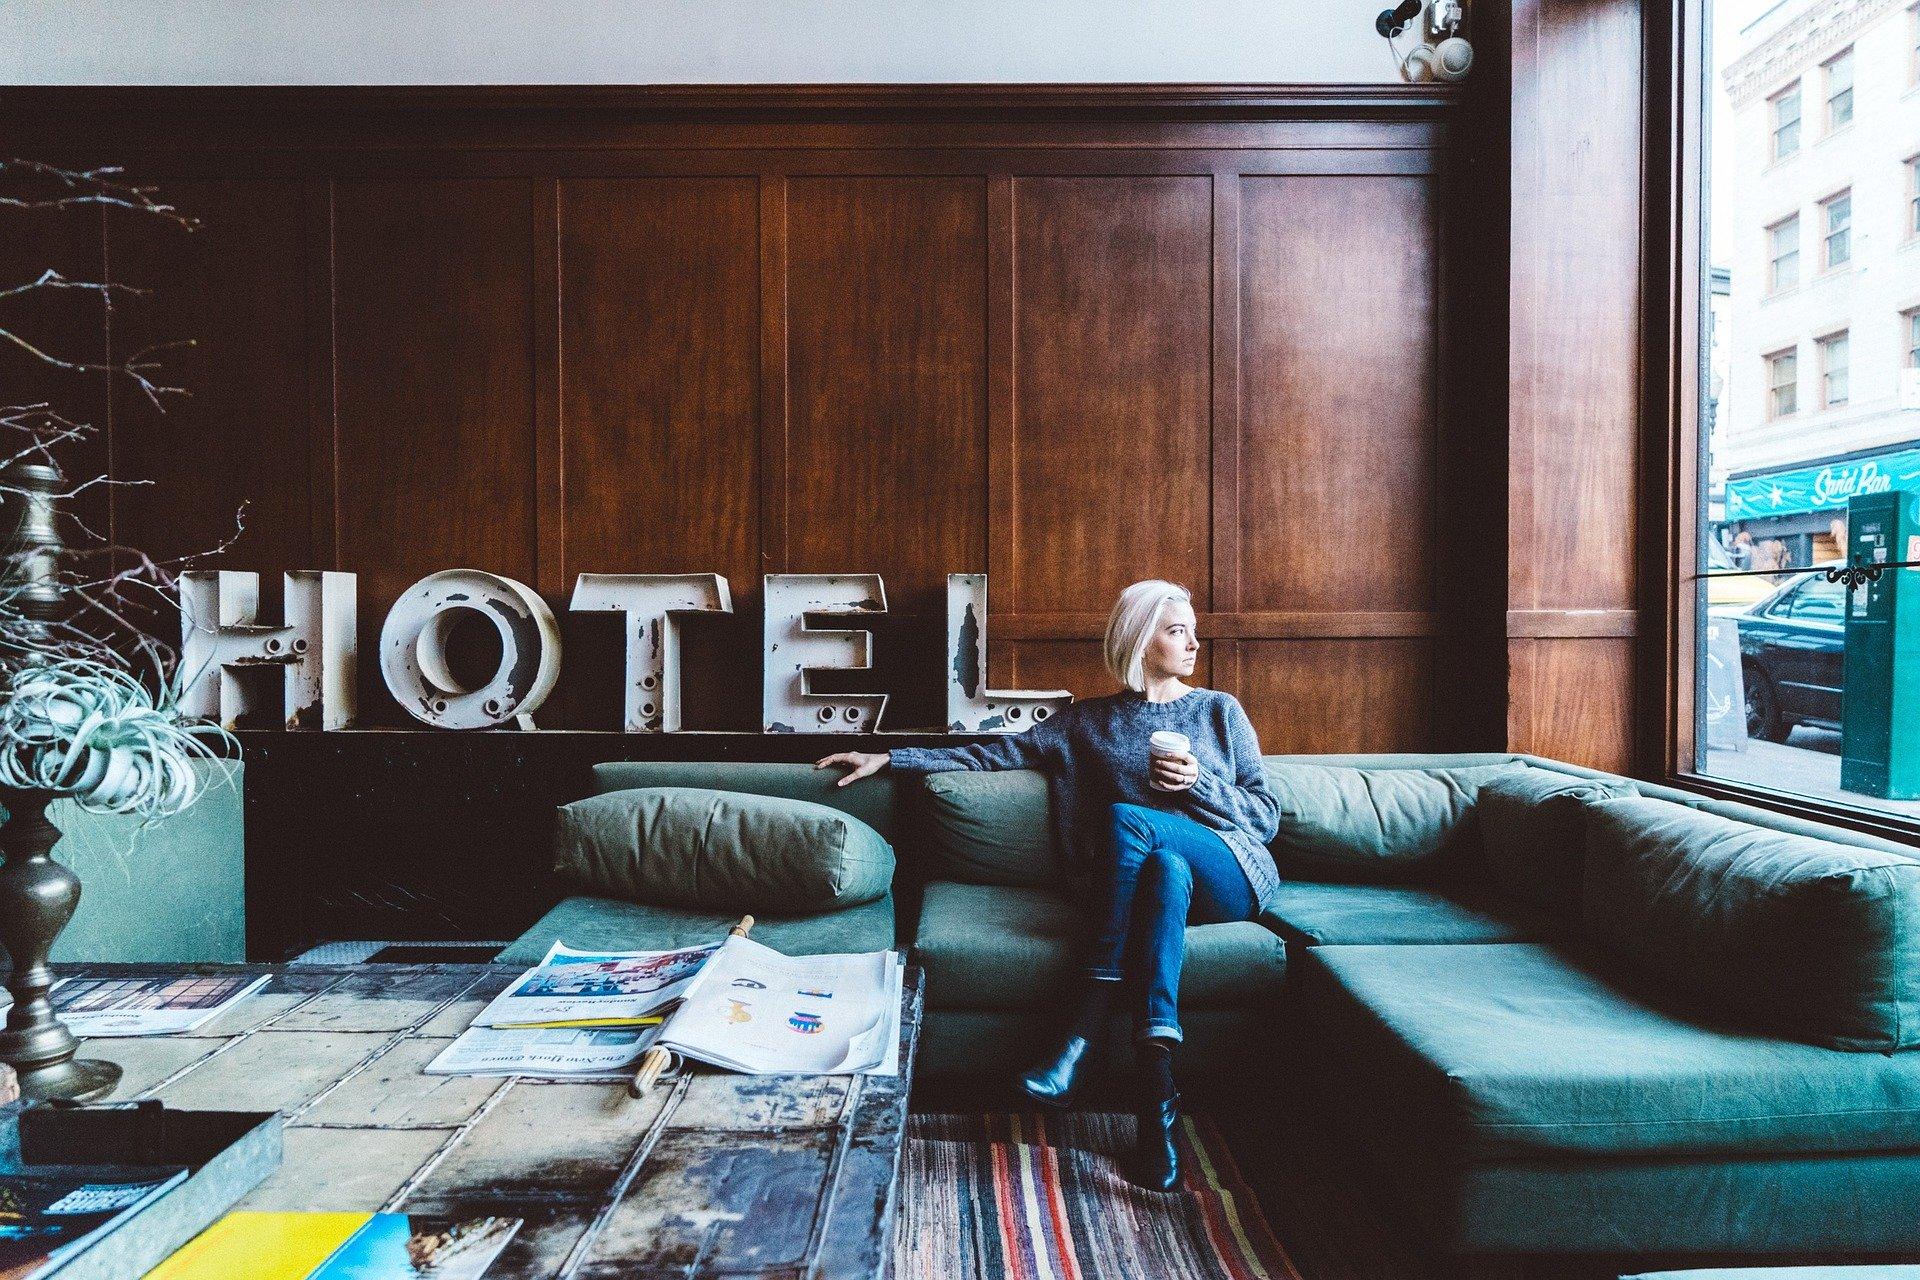 86 - Hotel